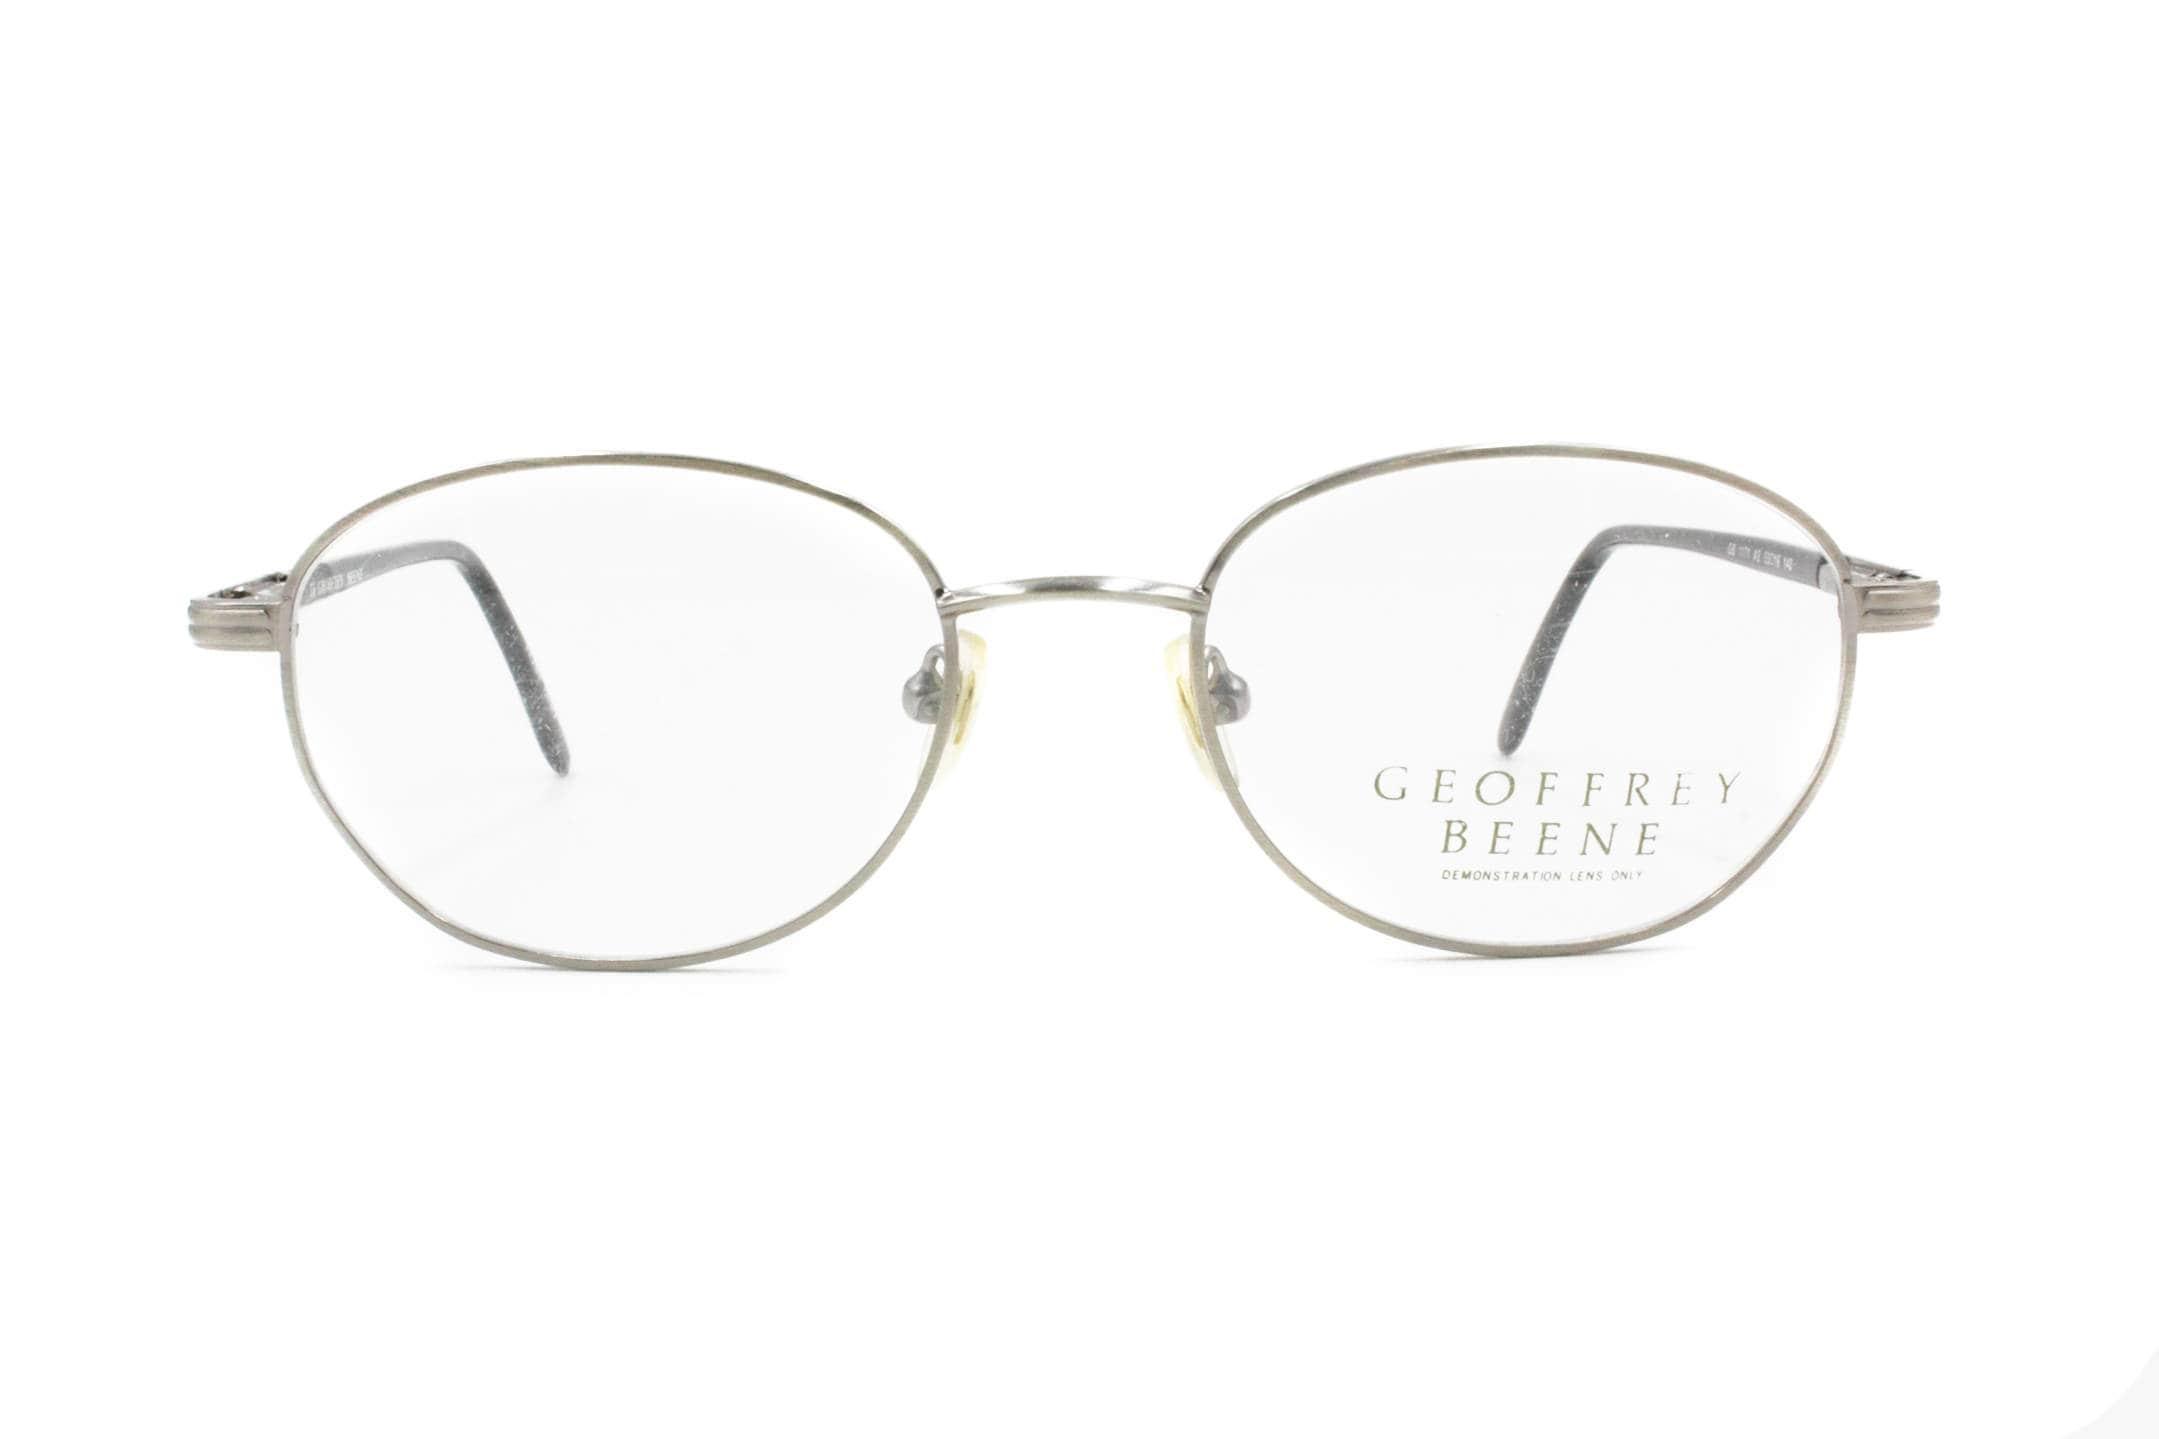 23f69f4cd45 Oval vintage eyeglasses GEOFFREY BEENE mod. GB 1171 silver   black classic  reading glasses medium